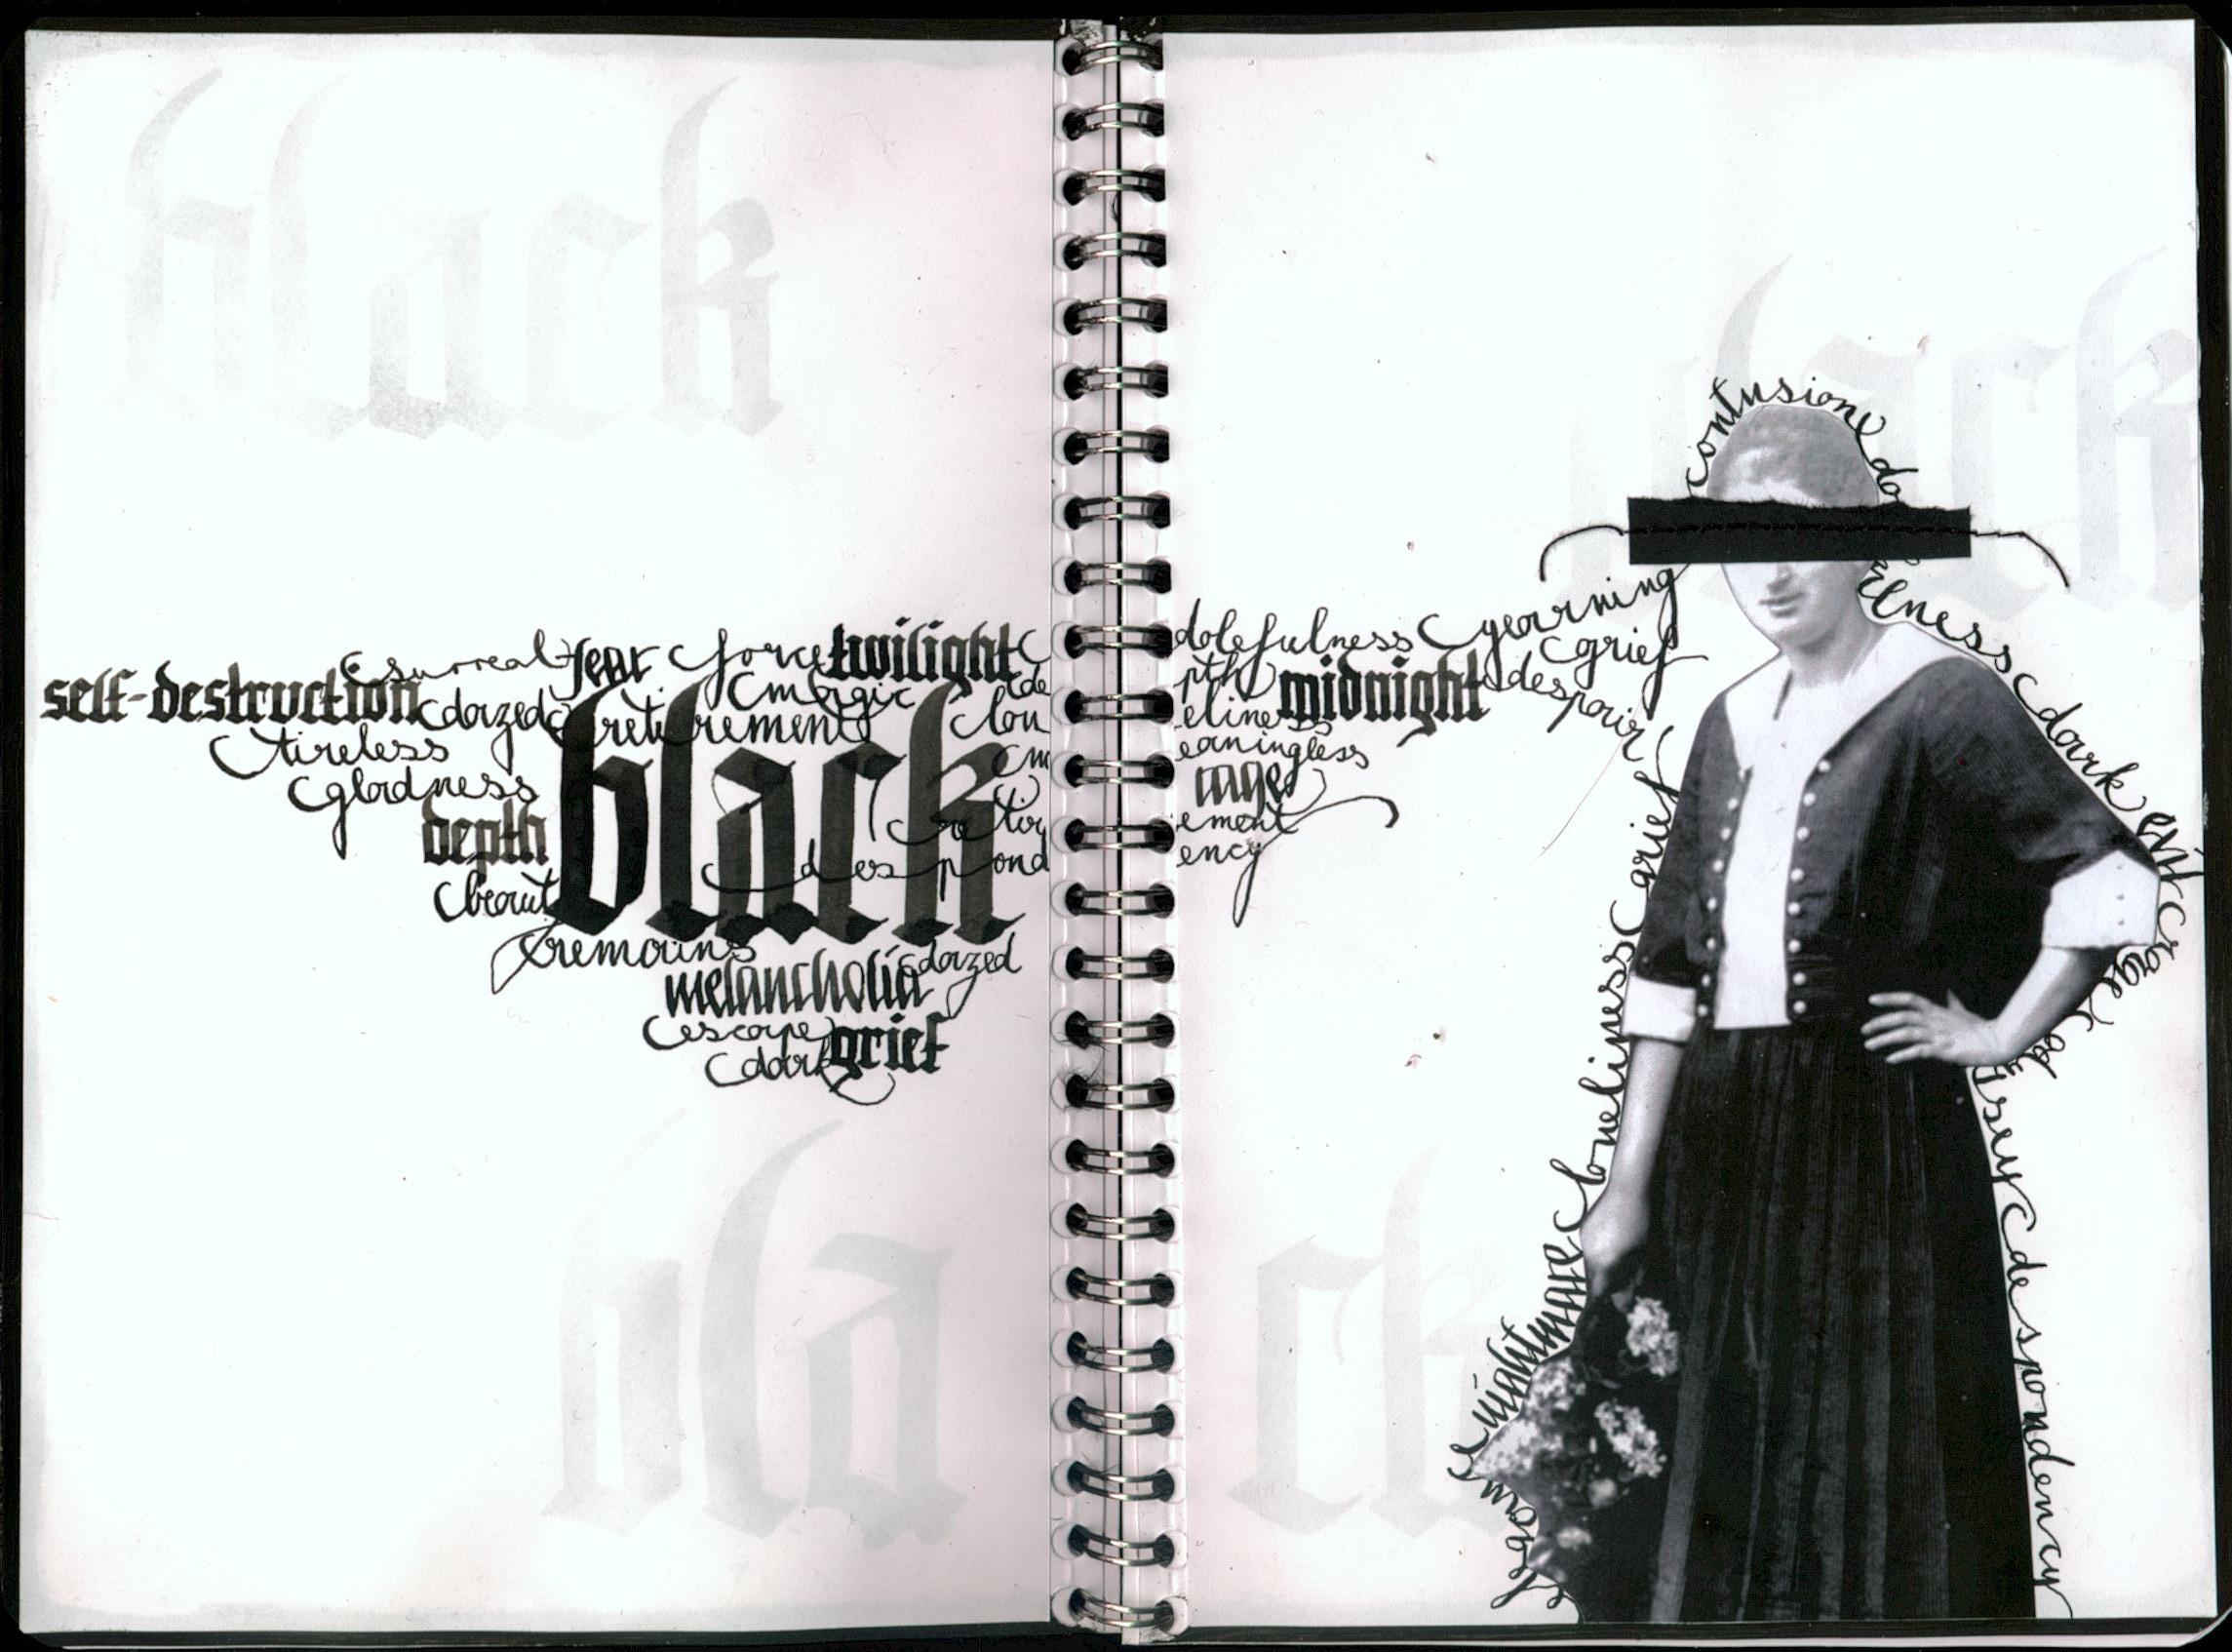 black confusion